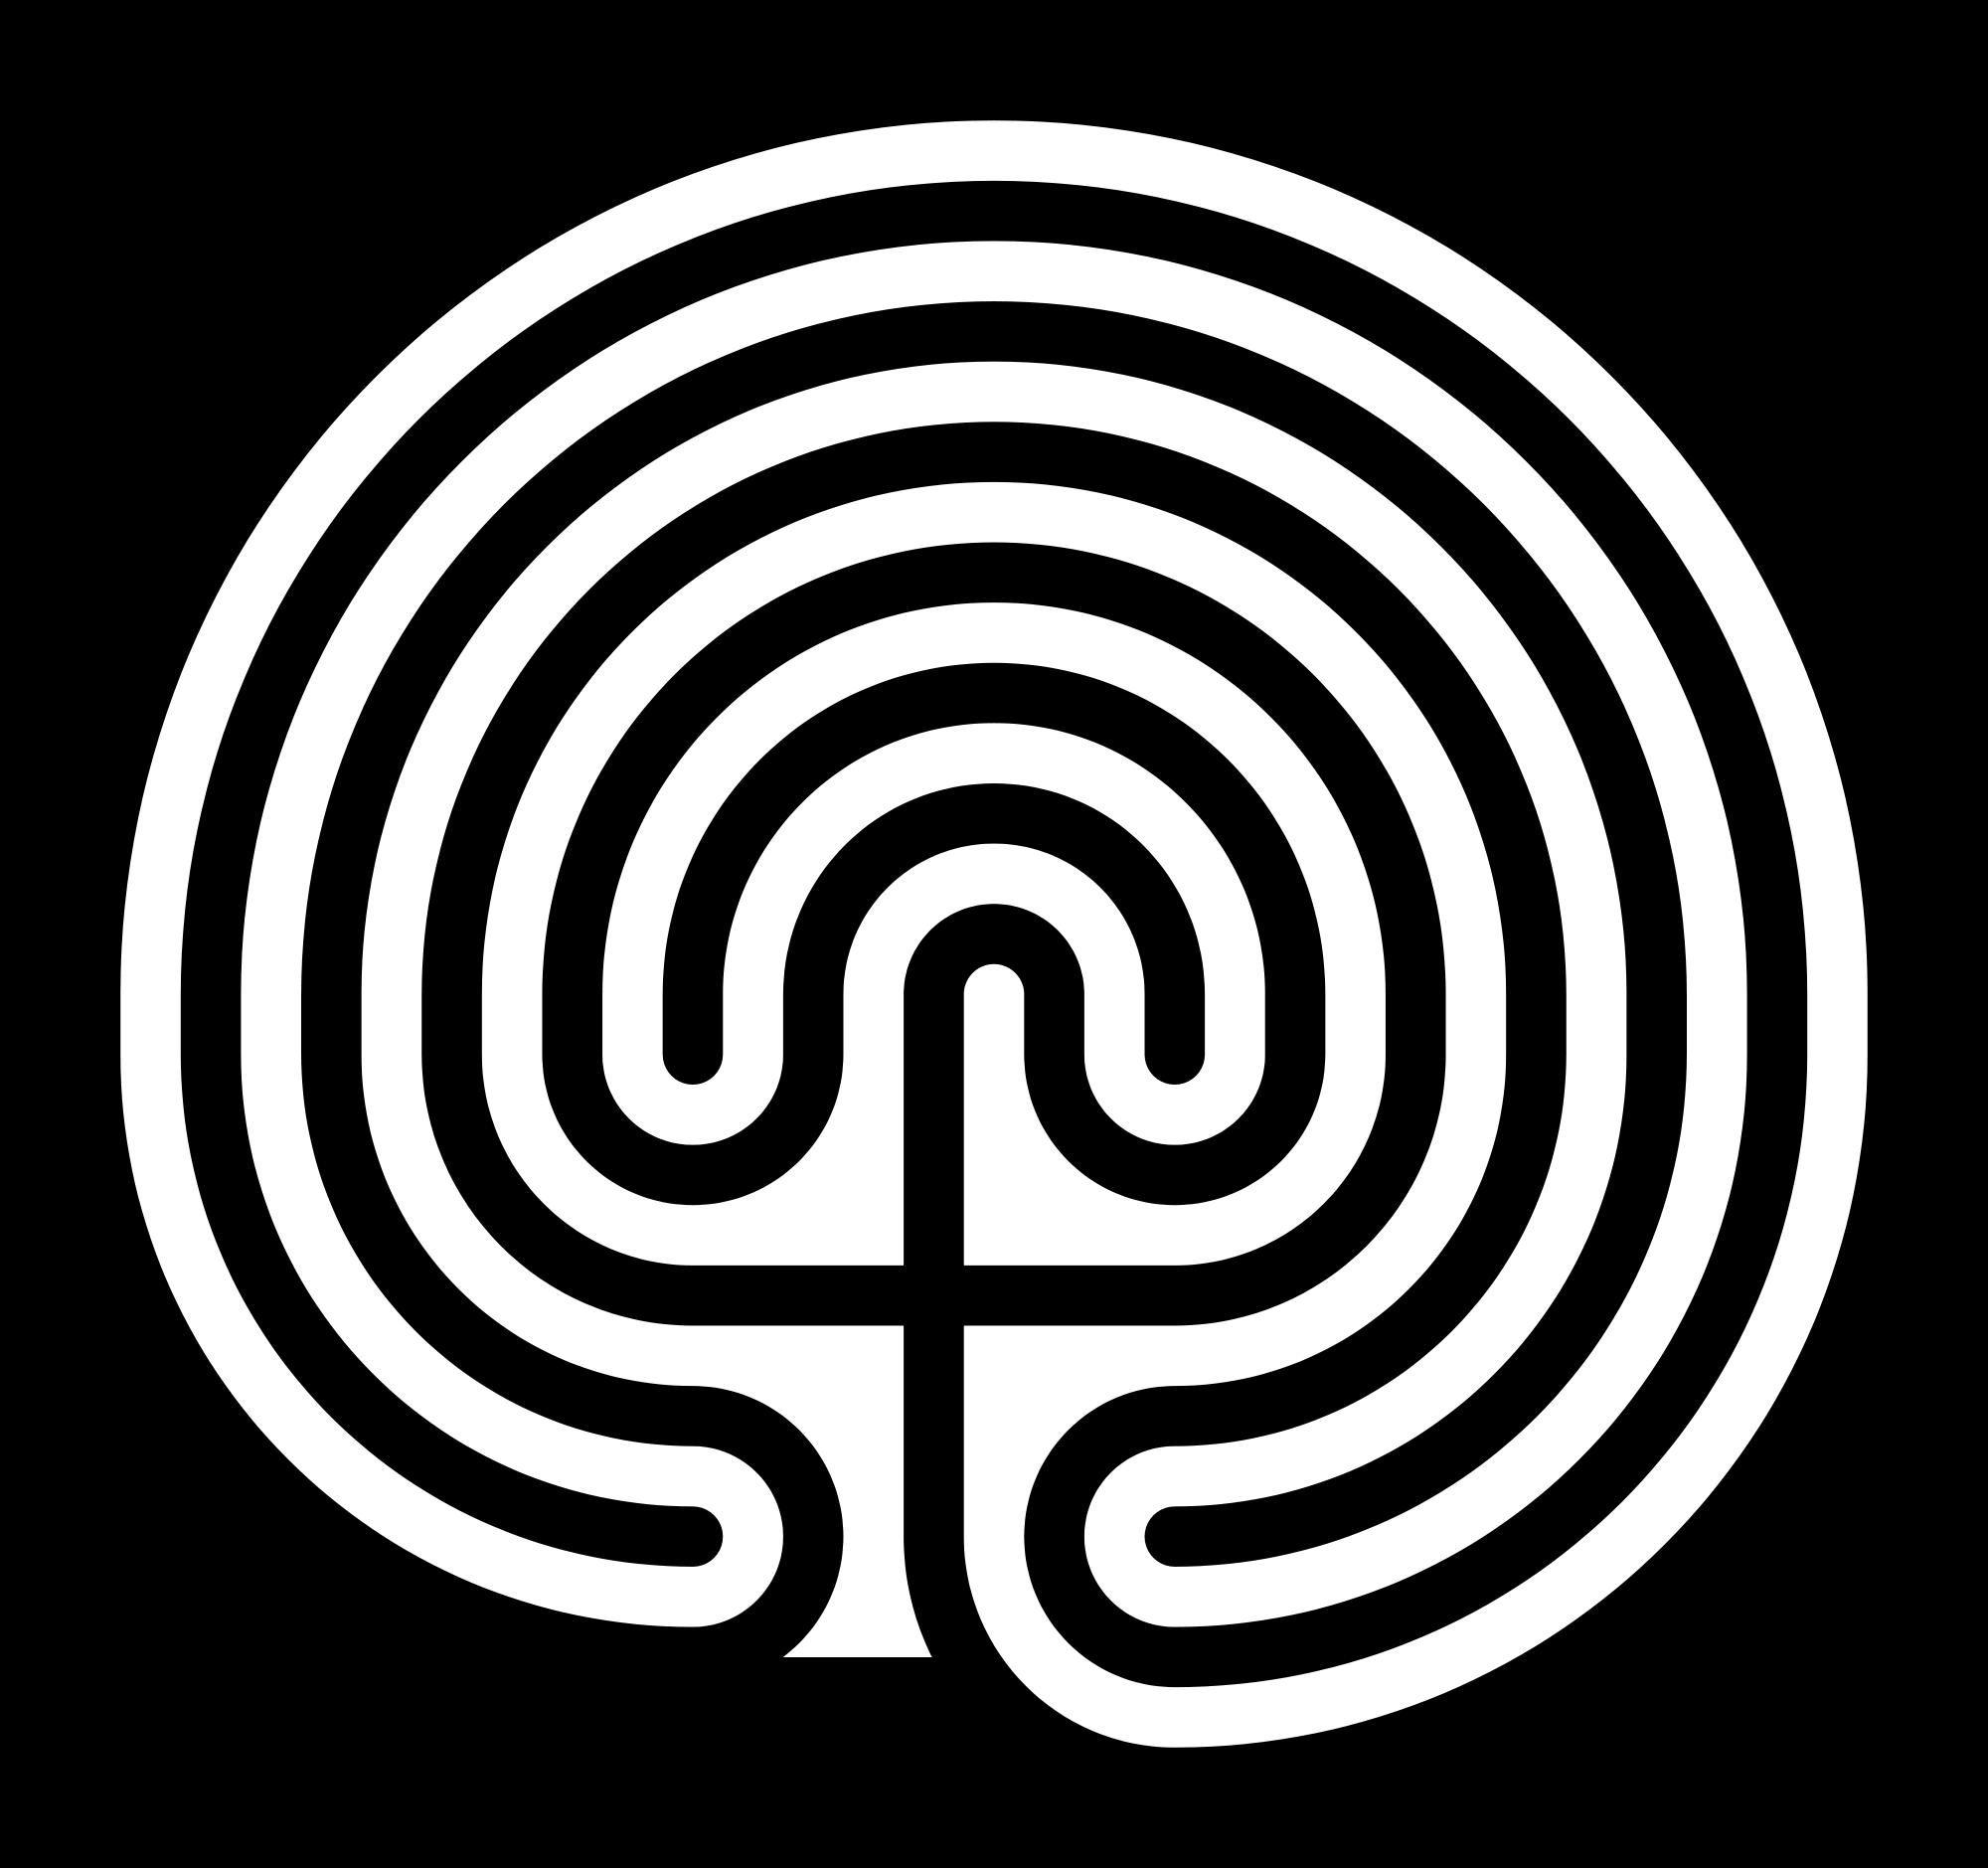 cretan labyrinth